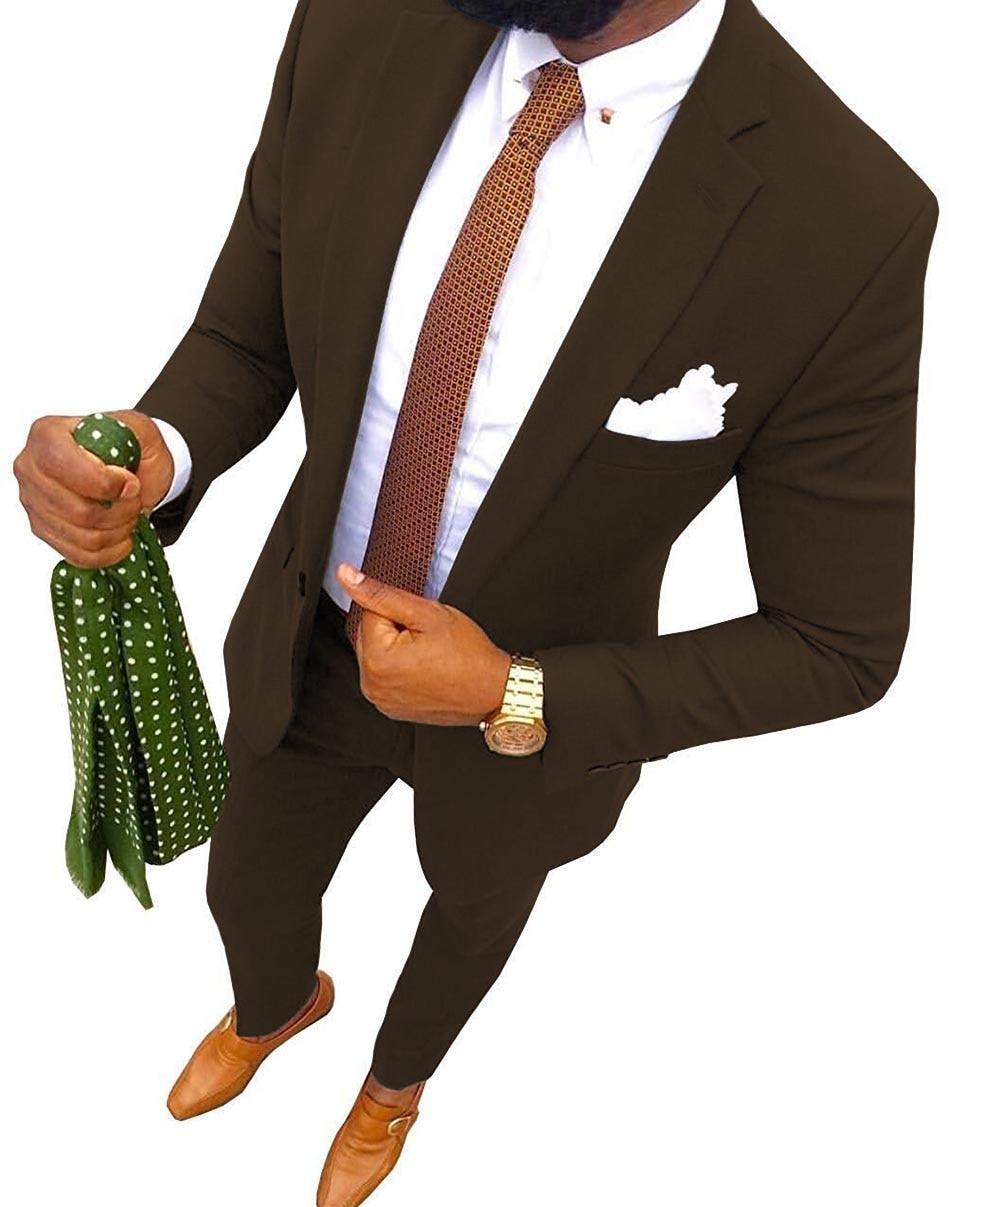 New Coffee Men's Suit Fashion 2-Piece Notch Lapel Flat Slim Fit Tuxedos Groomsmen Blazer For Wedding Graduation Party